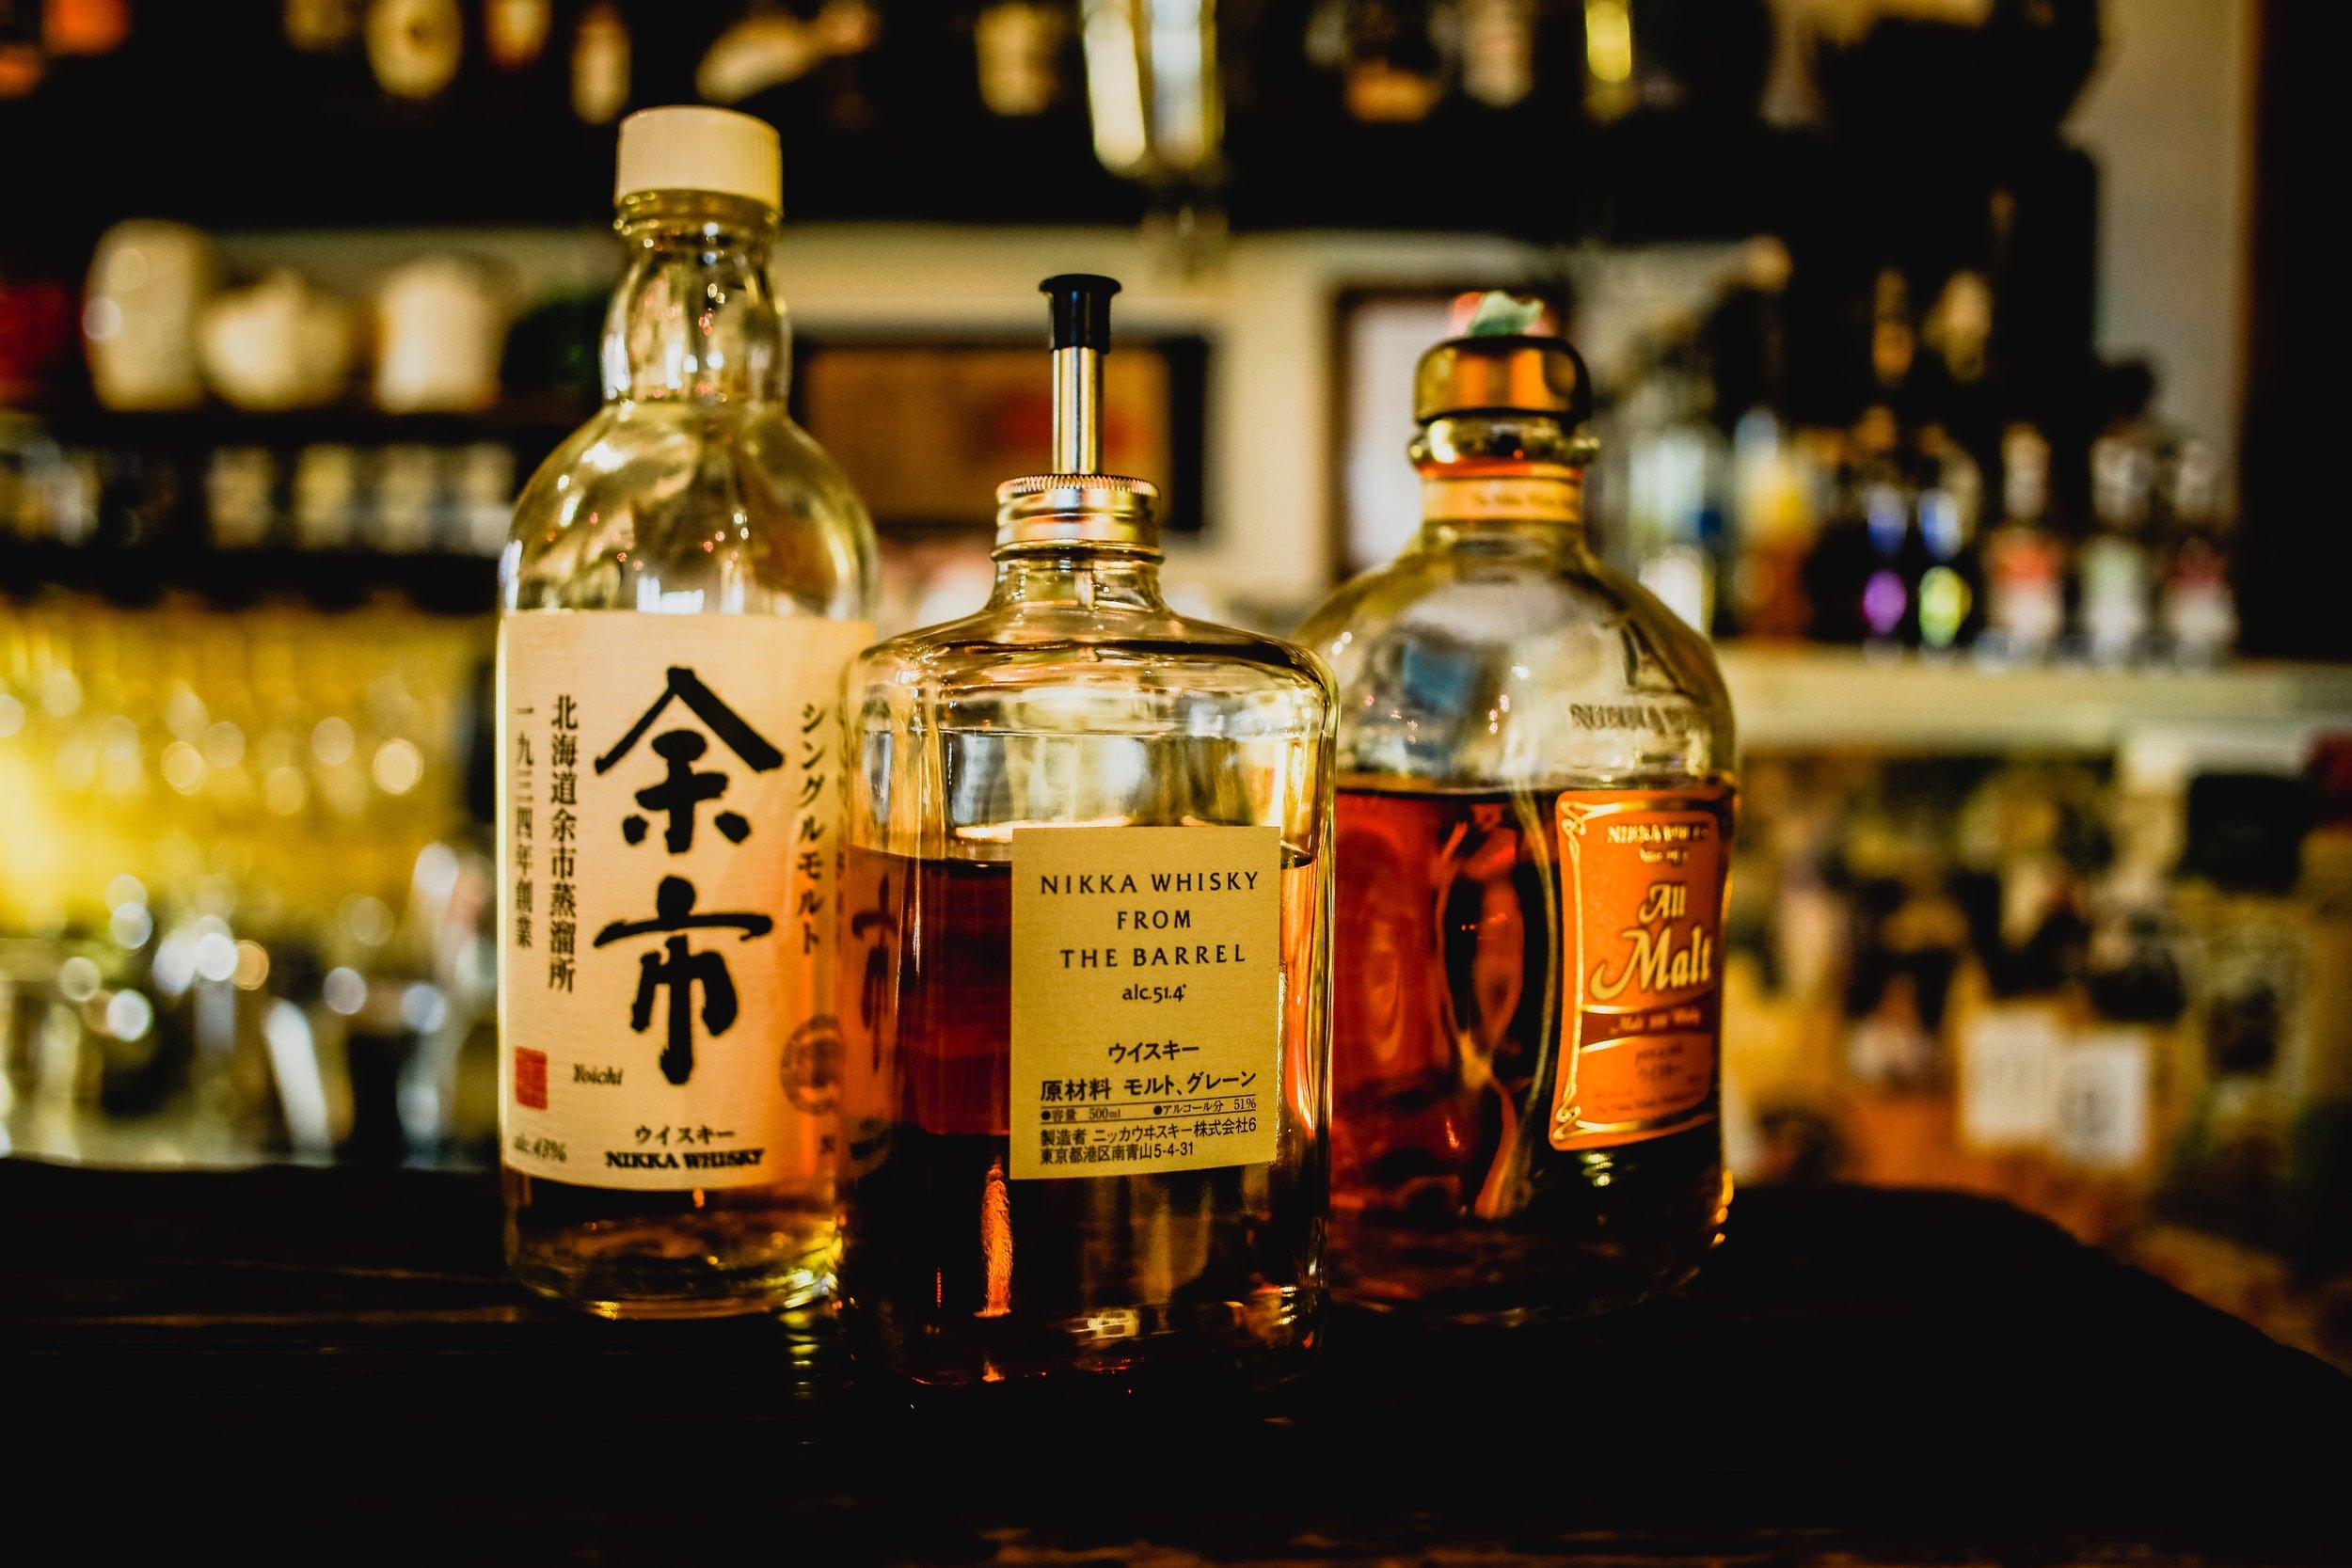 Non-Retail - Liquor Licenses